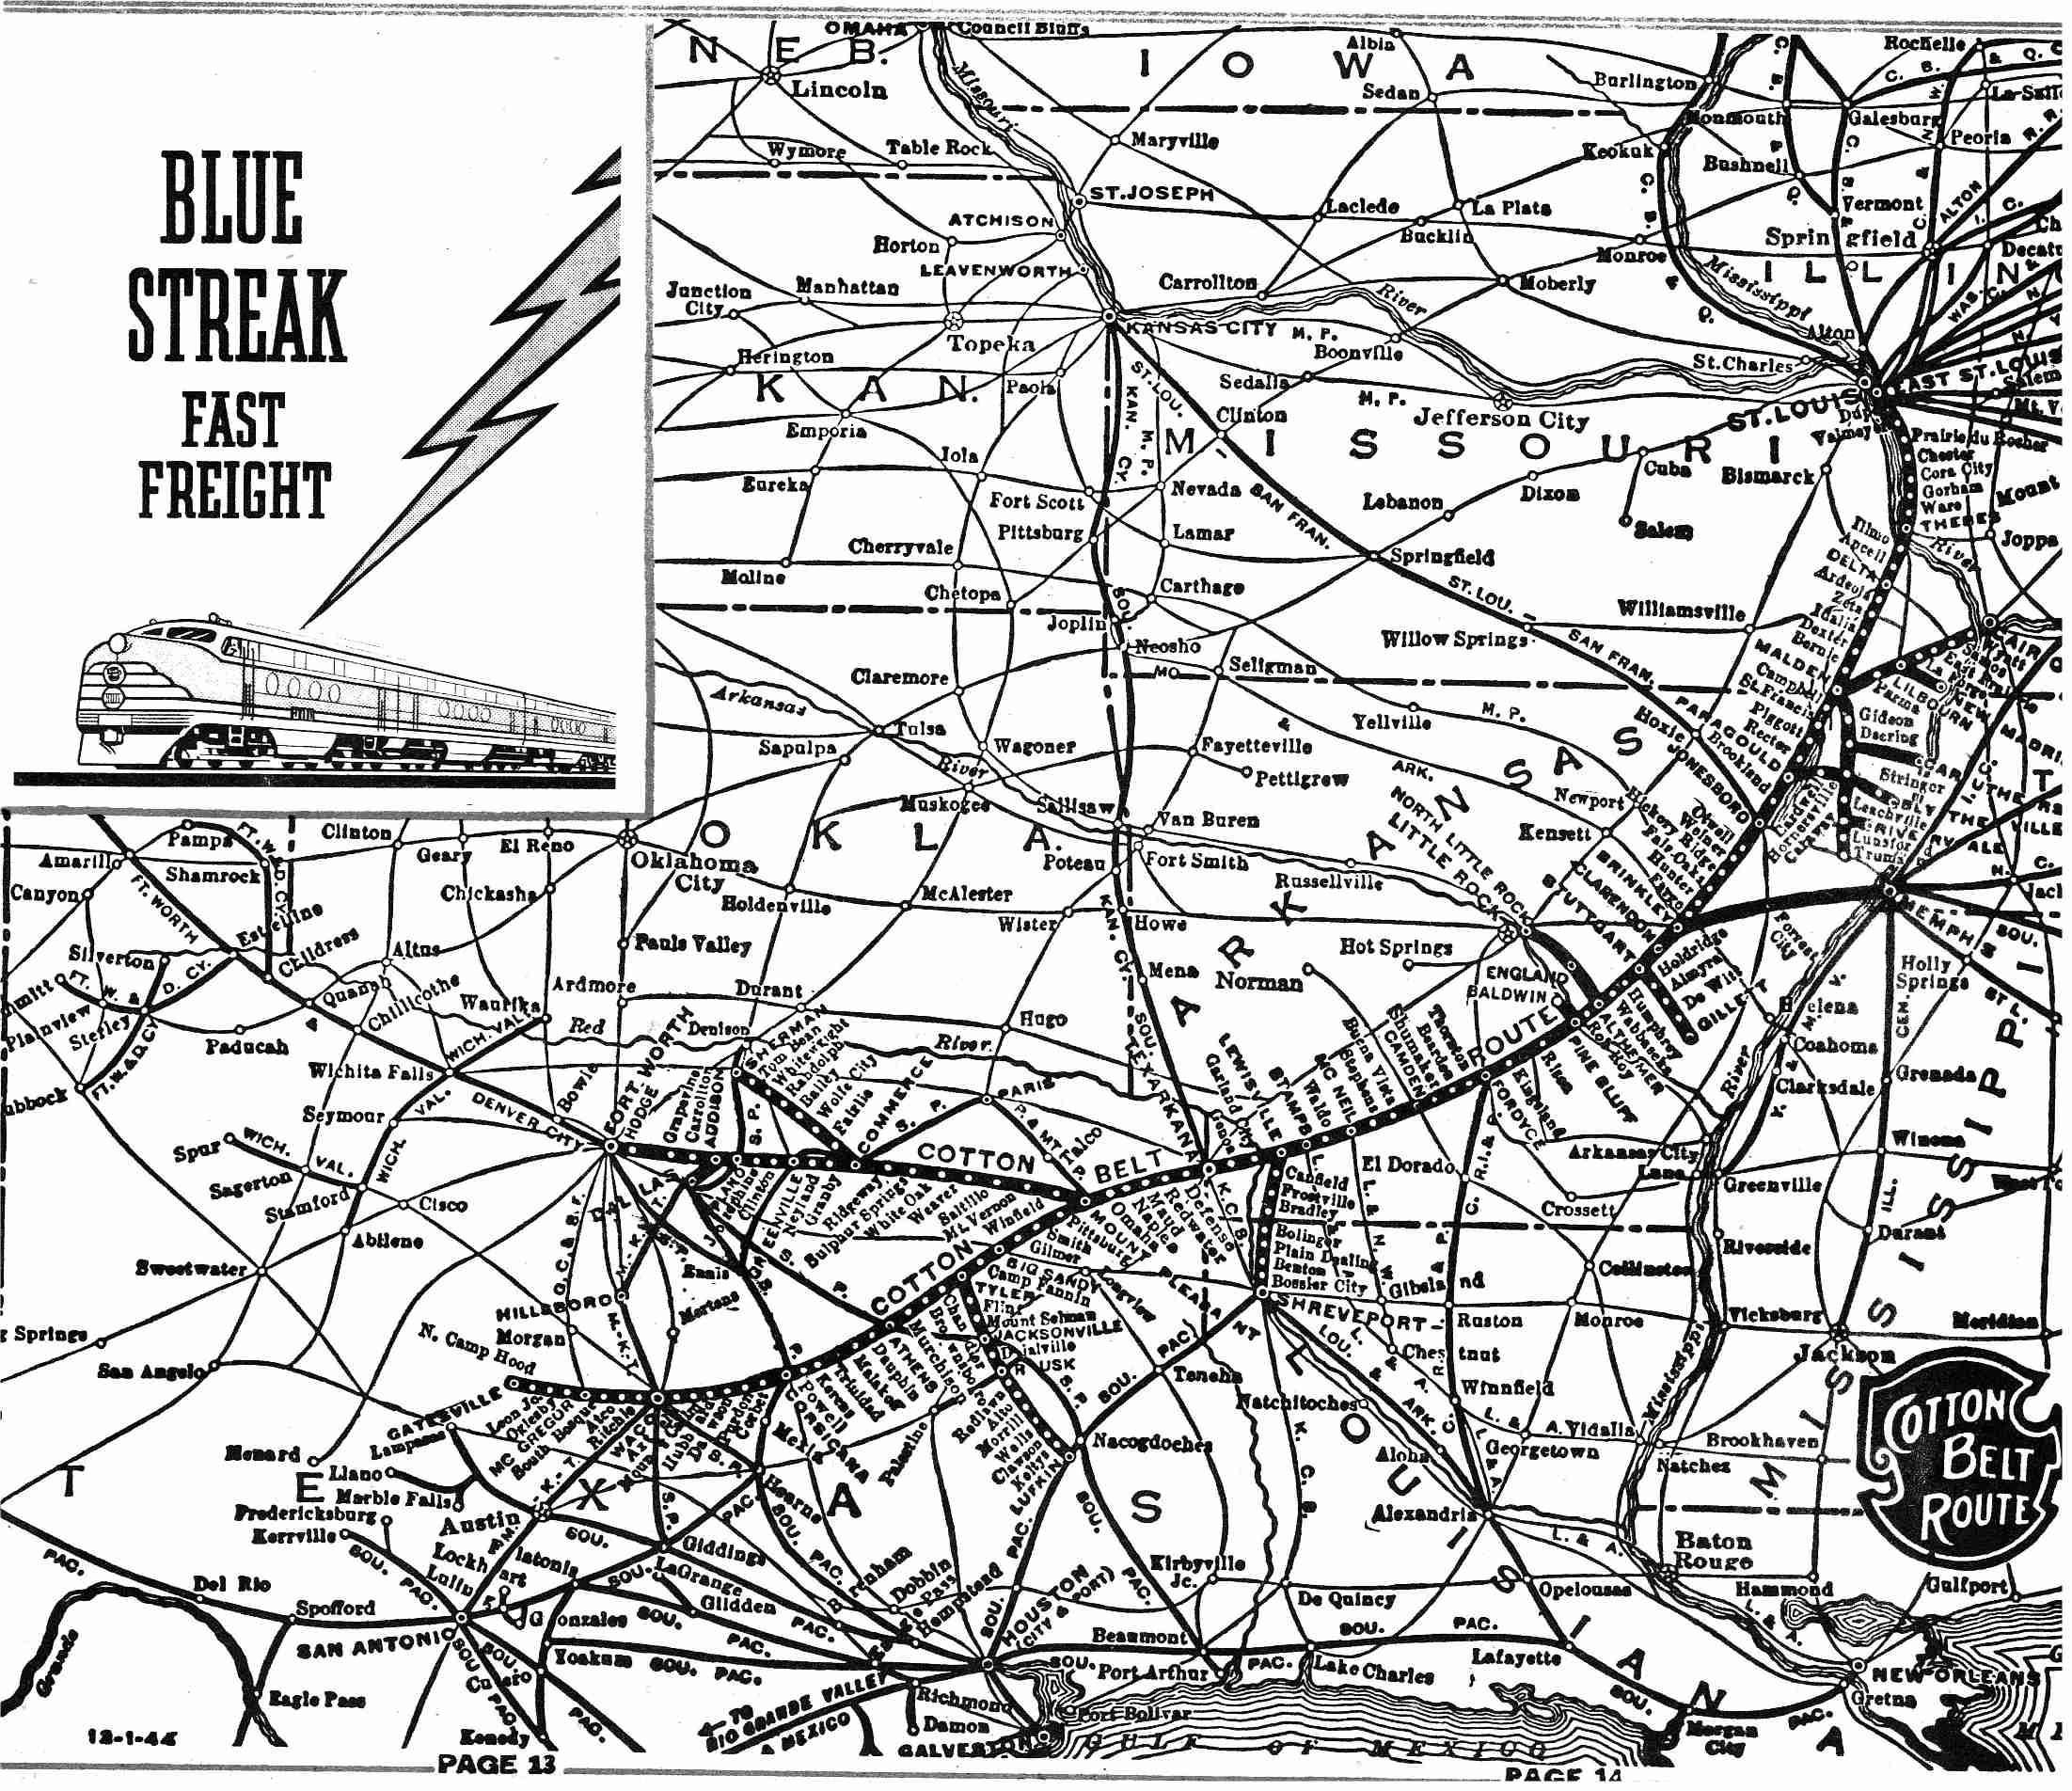 Transportation Company - Cotton Belt - Railroad